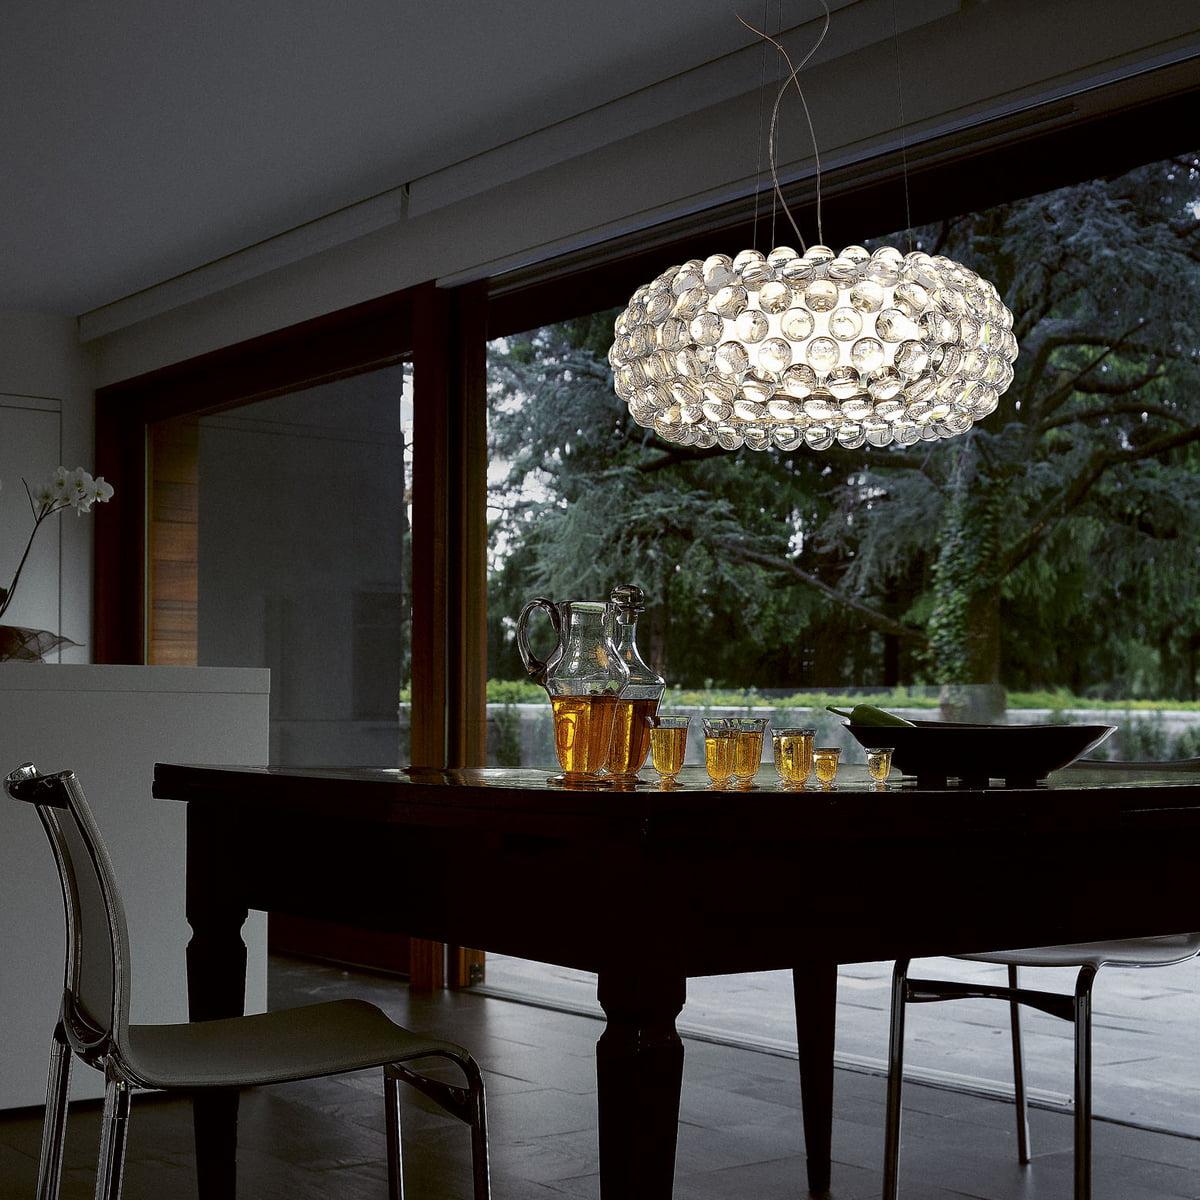 foscarini caboche led pendelleuchte bei. Black Bedroom Furniture Sets. Home Design Ideas